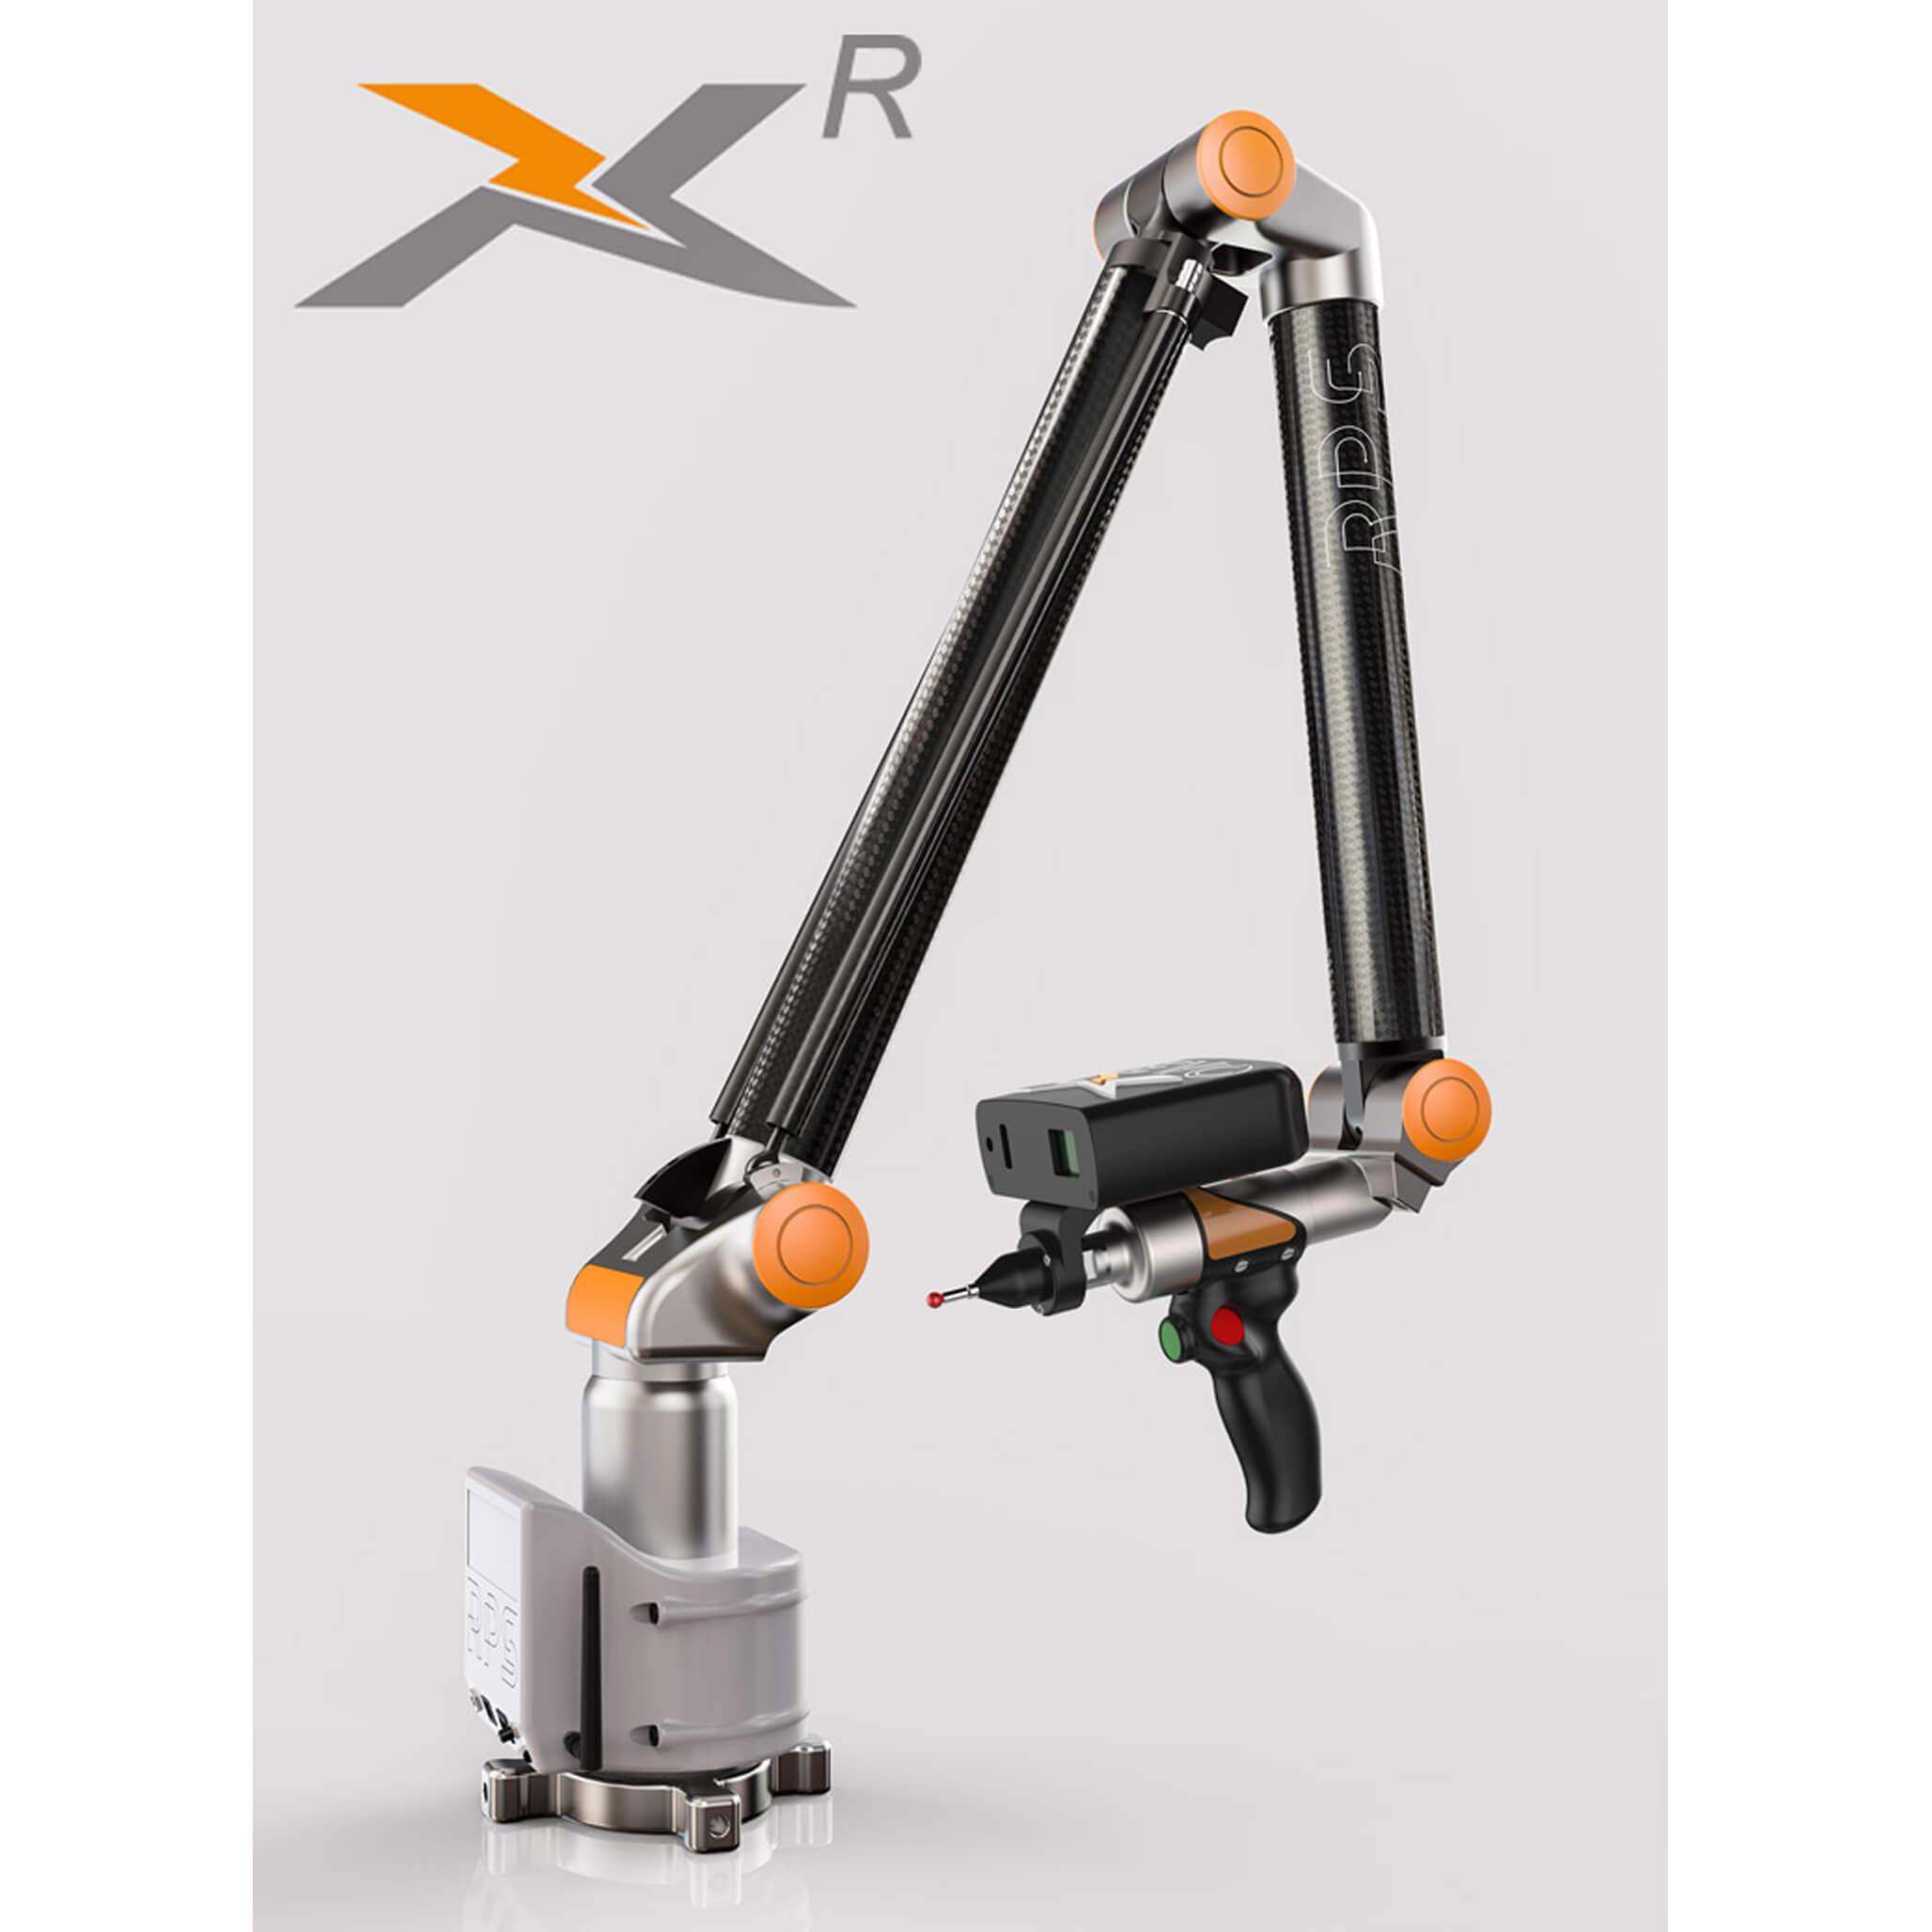 RPS Evo XR Detachable laser measuring arm